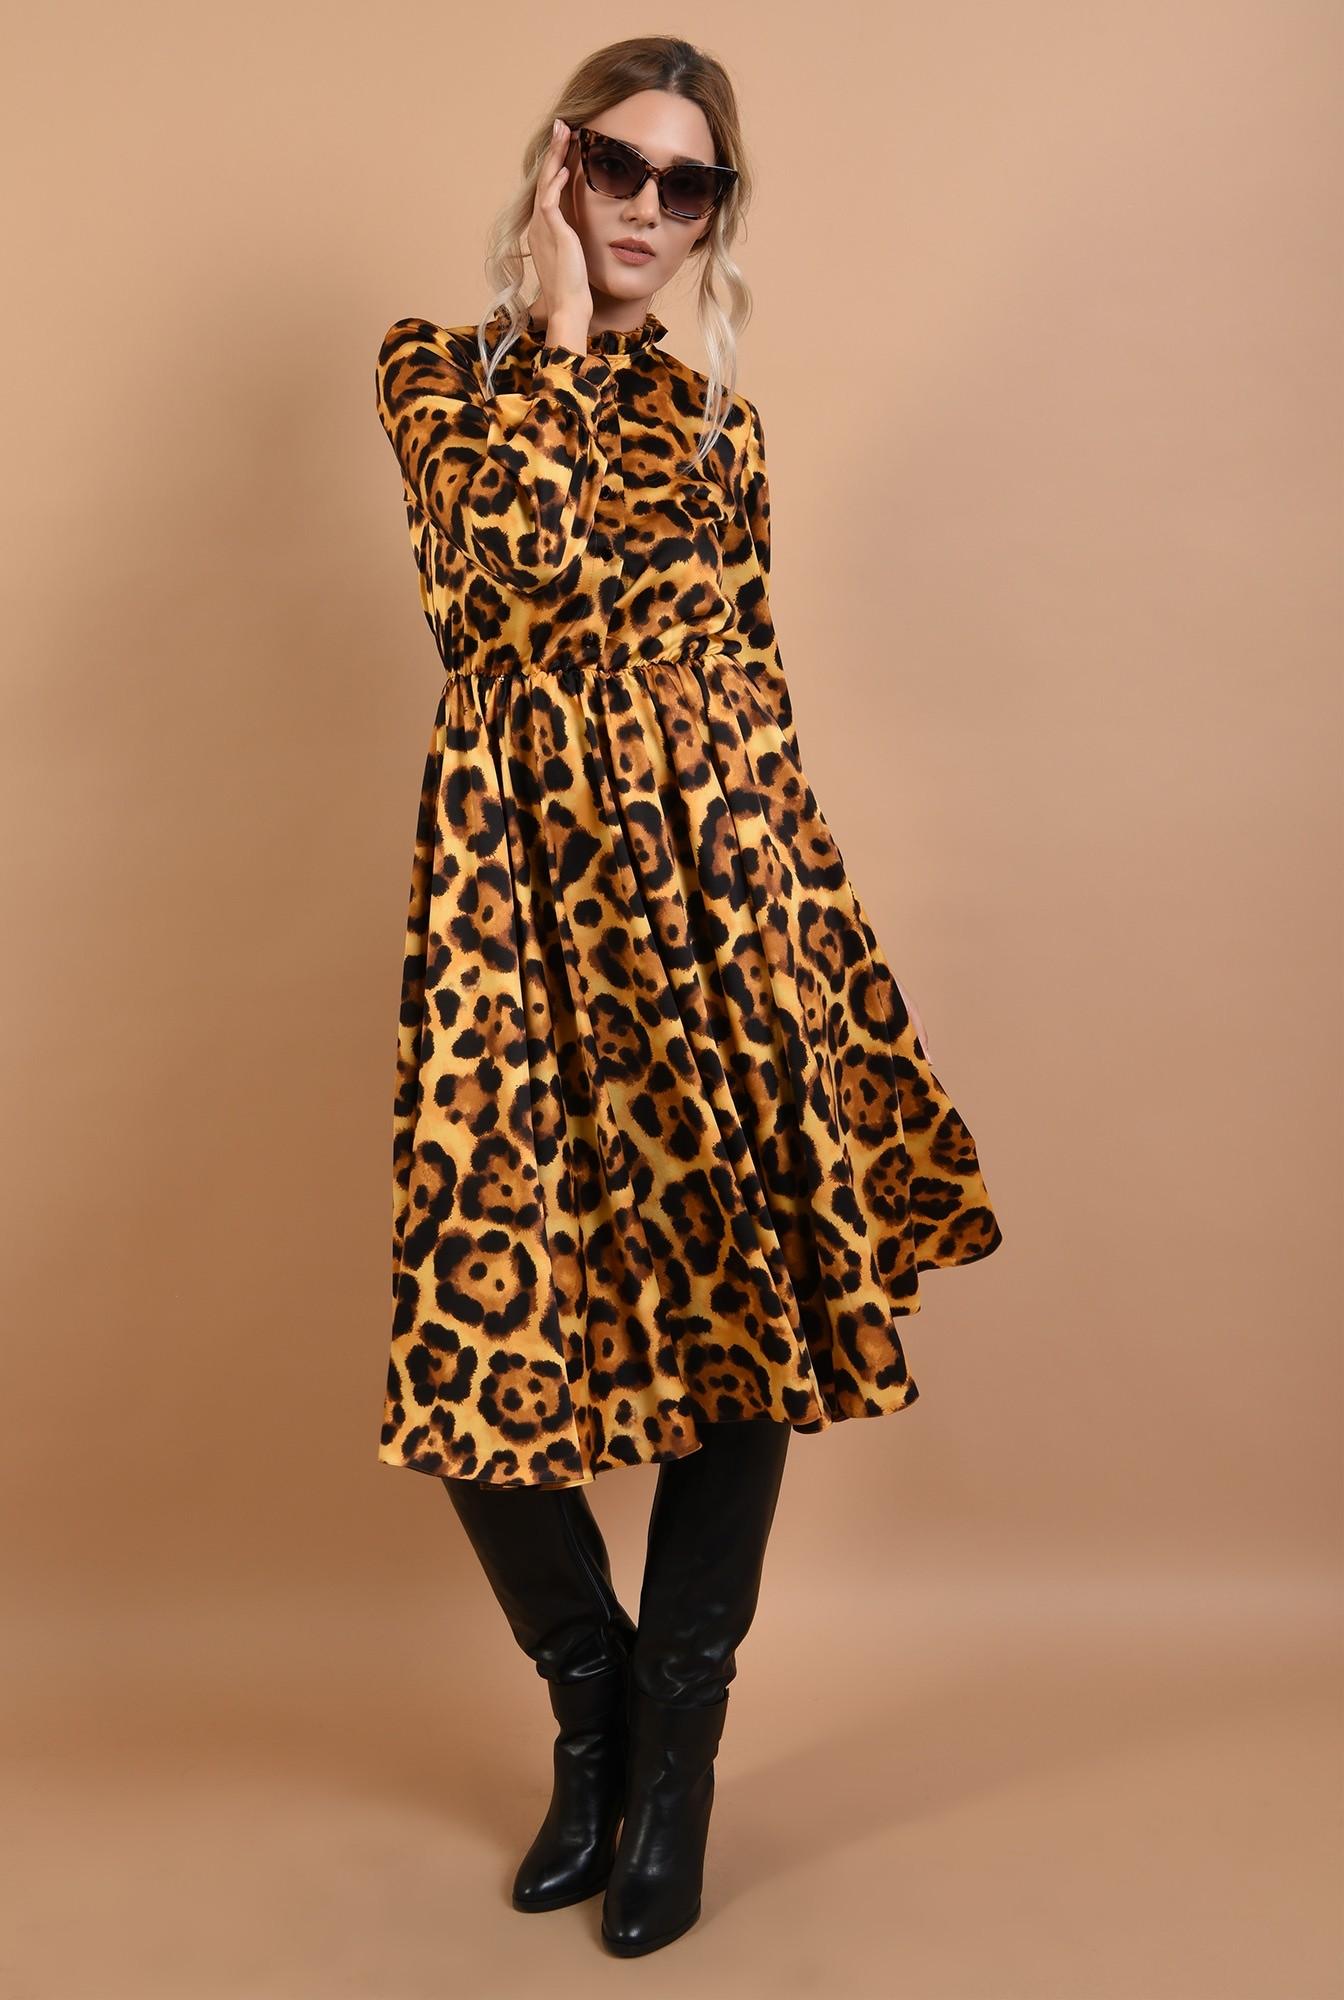 3 - rochie eleganta, din satin animal print, cu nasturi, cu guler, Poema